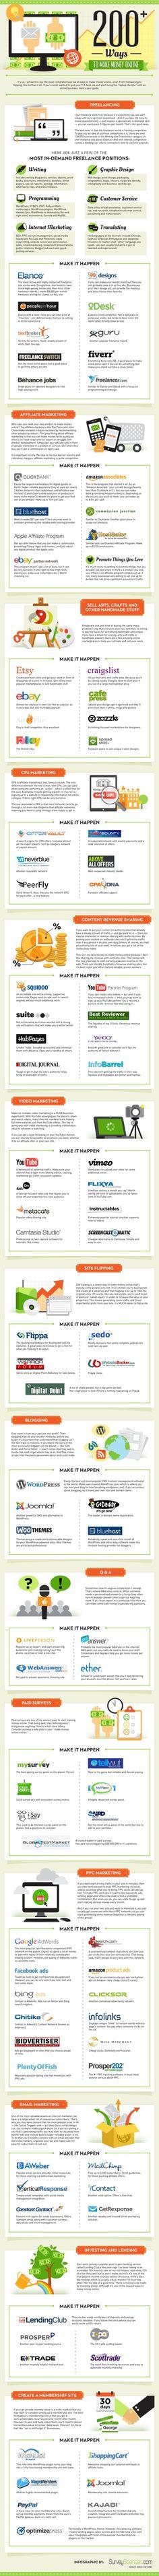 Ways to make money online #infographic